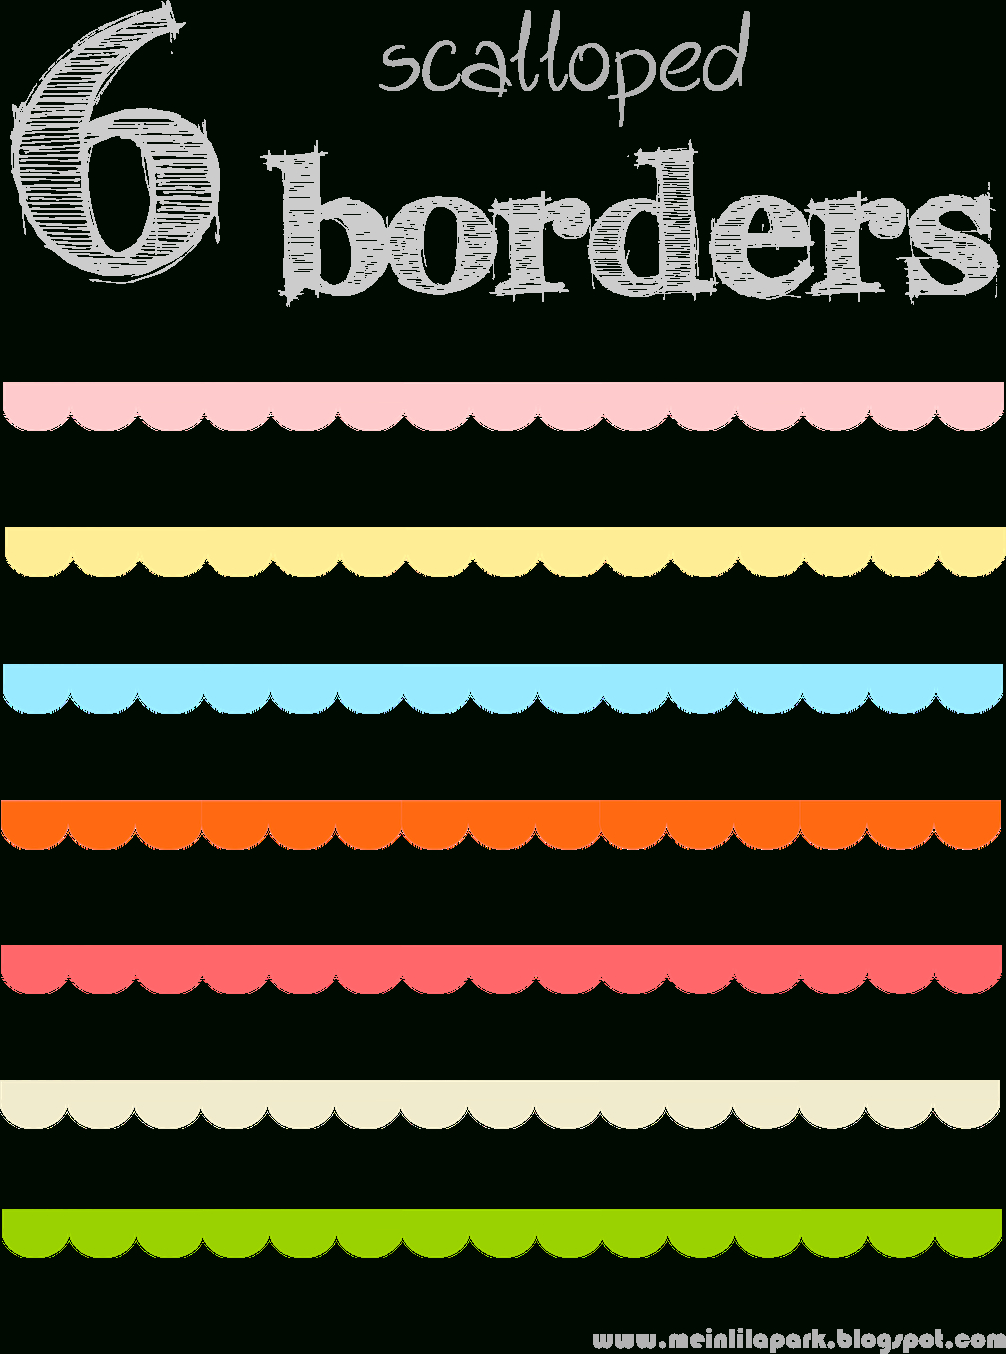 Free Digital Scalloped Scrapbooking Border Png's - Muschelränder - Free Printable Borders For Scrapbooking